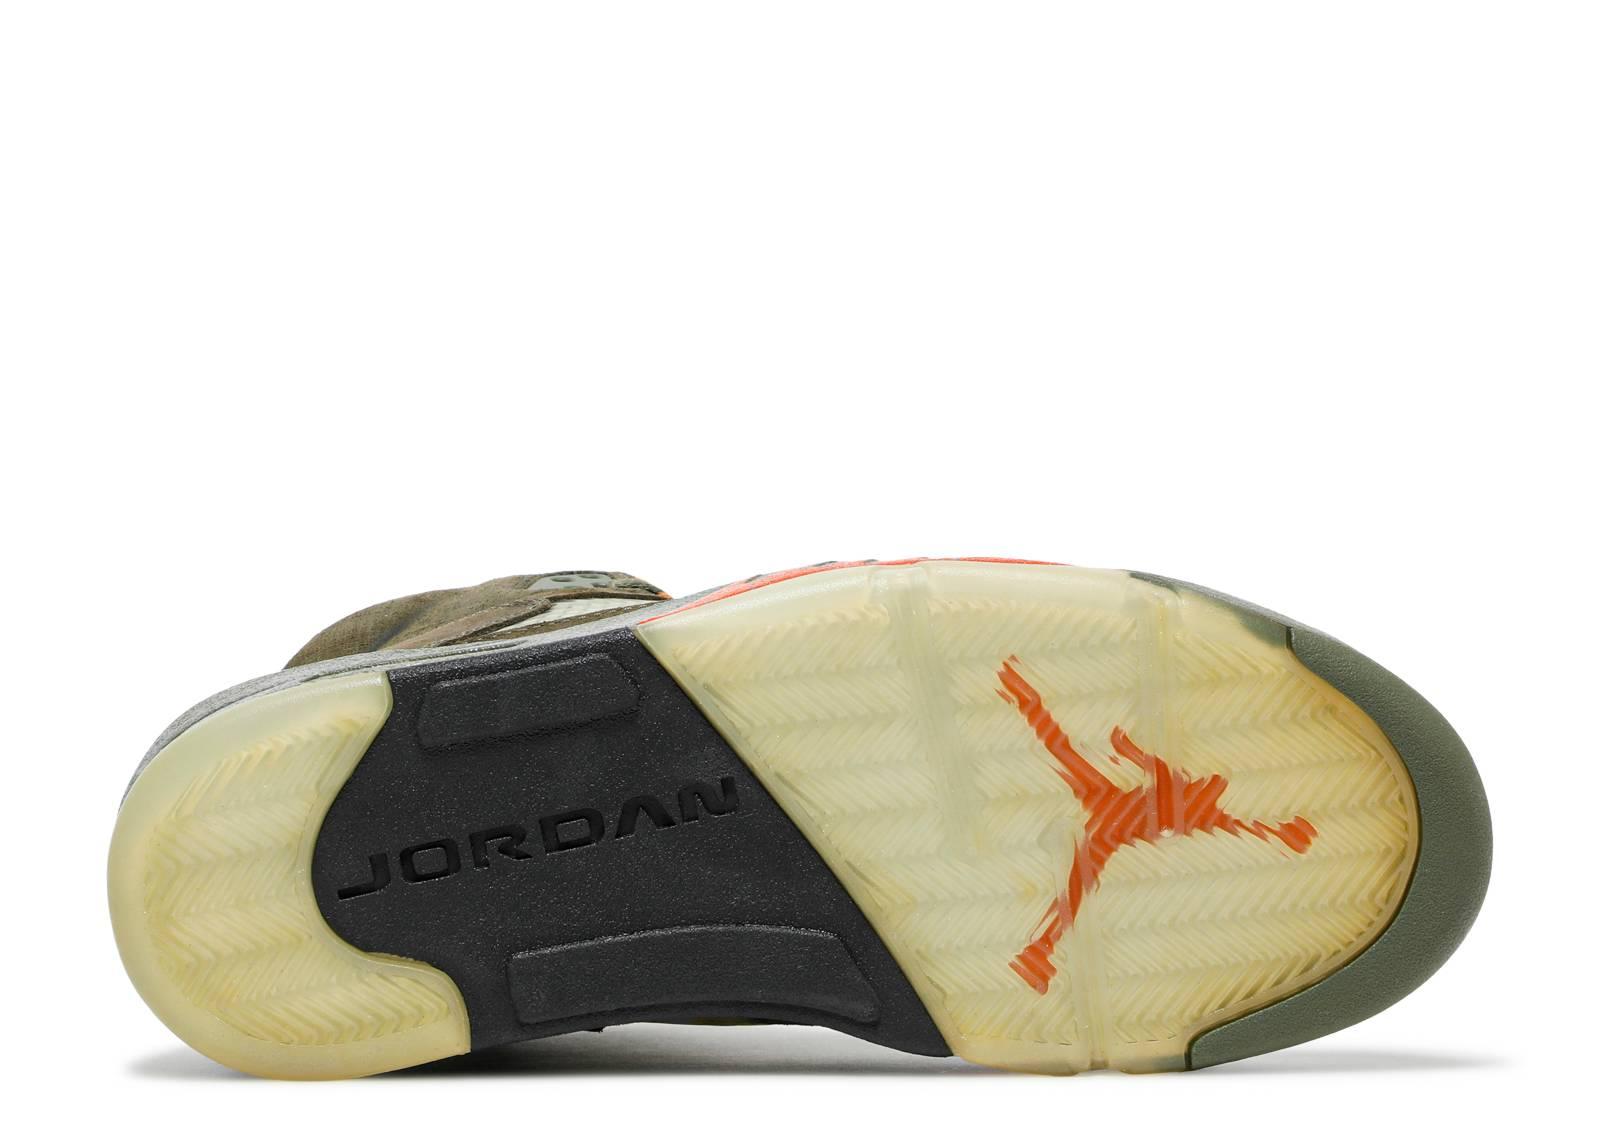 5598f2c261c439 Air Jordan 5 Retro Ls - Air Jordan - 314259 381 - army olive solar orange